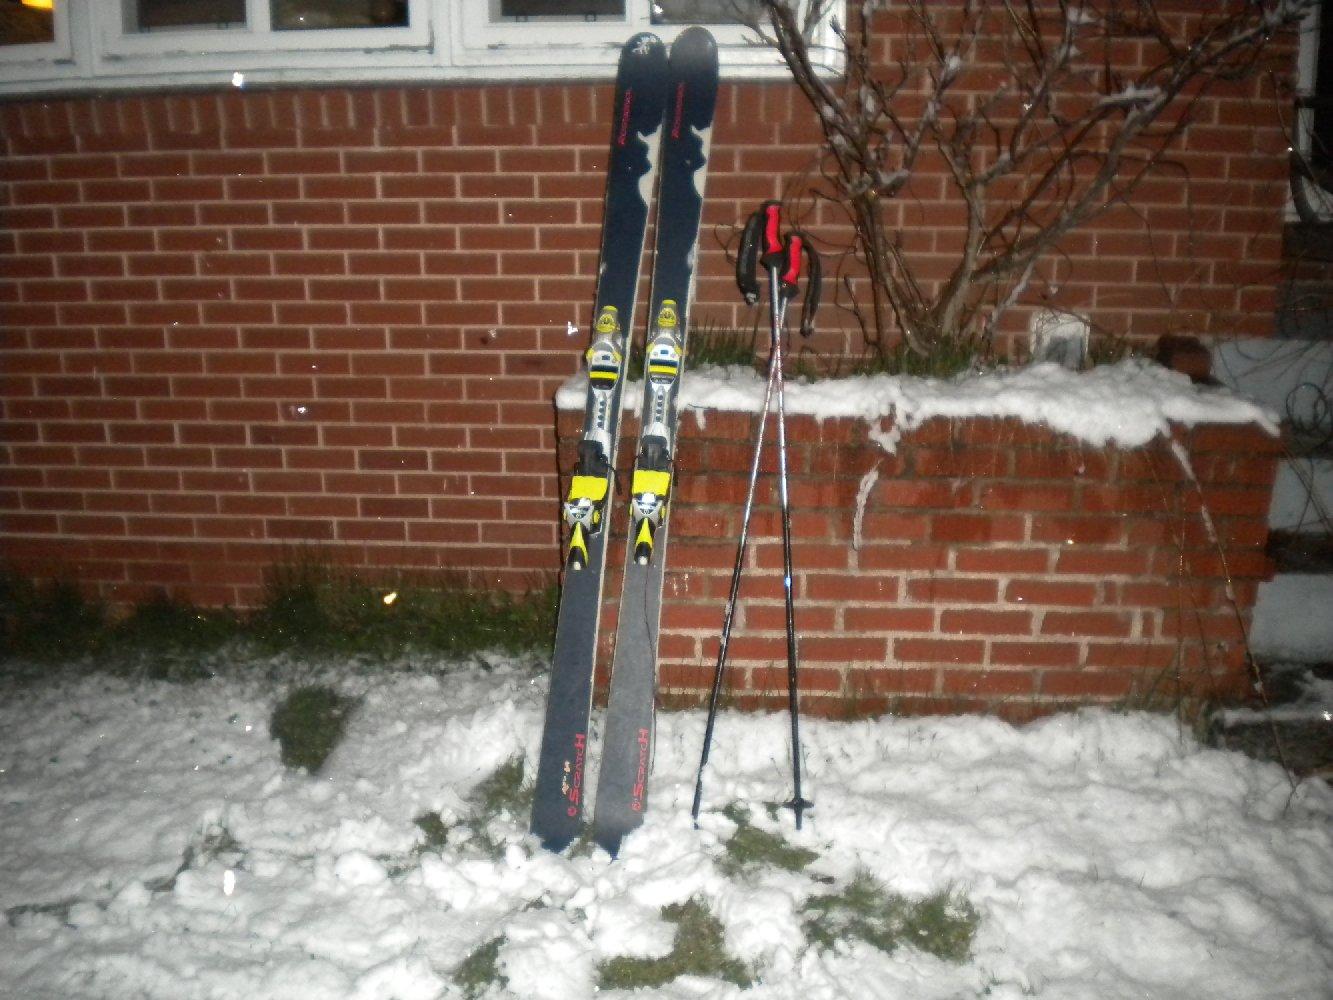 Backyard Skiing on April 18th - 2 of 27